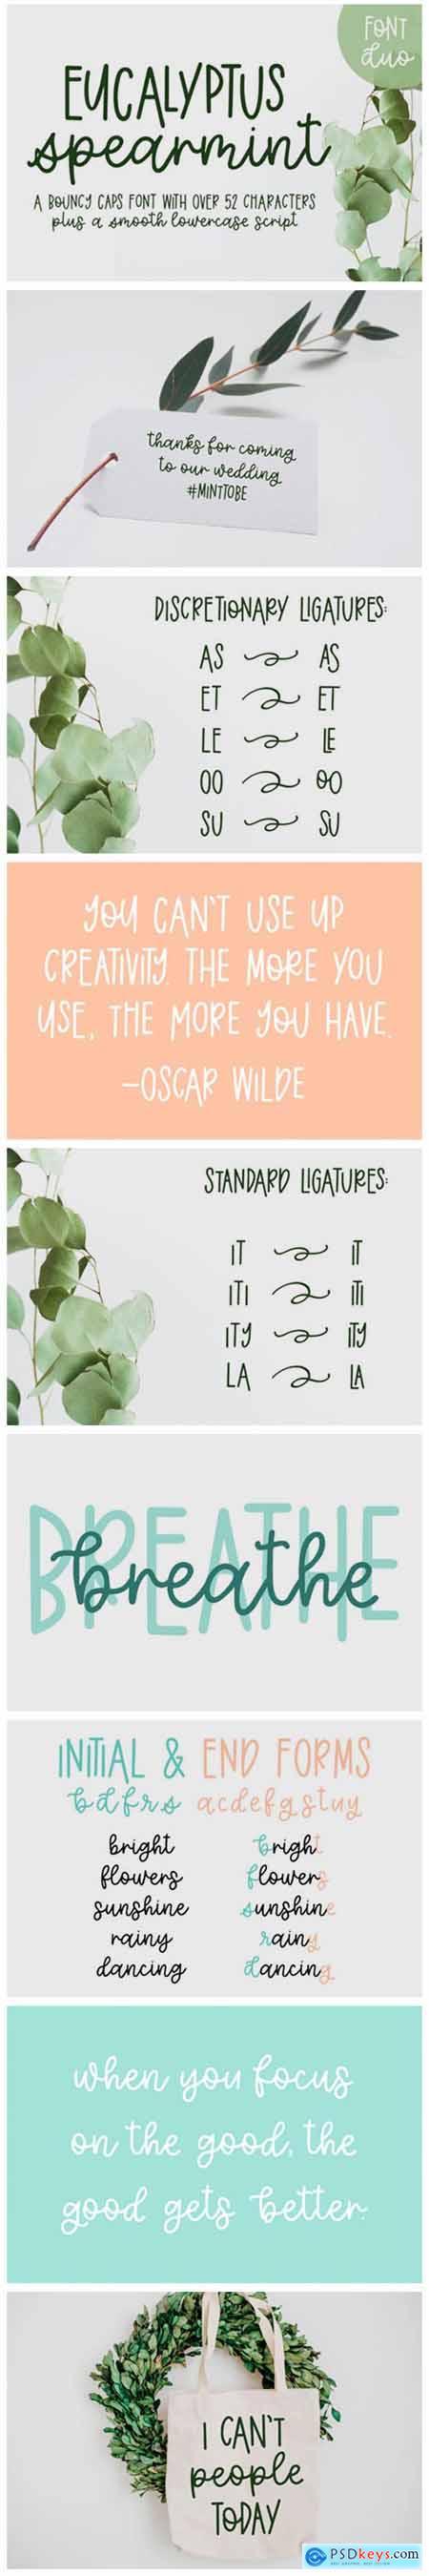 Eucalyptus Spearmint Font